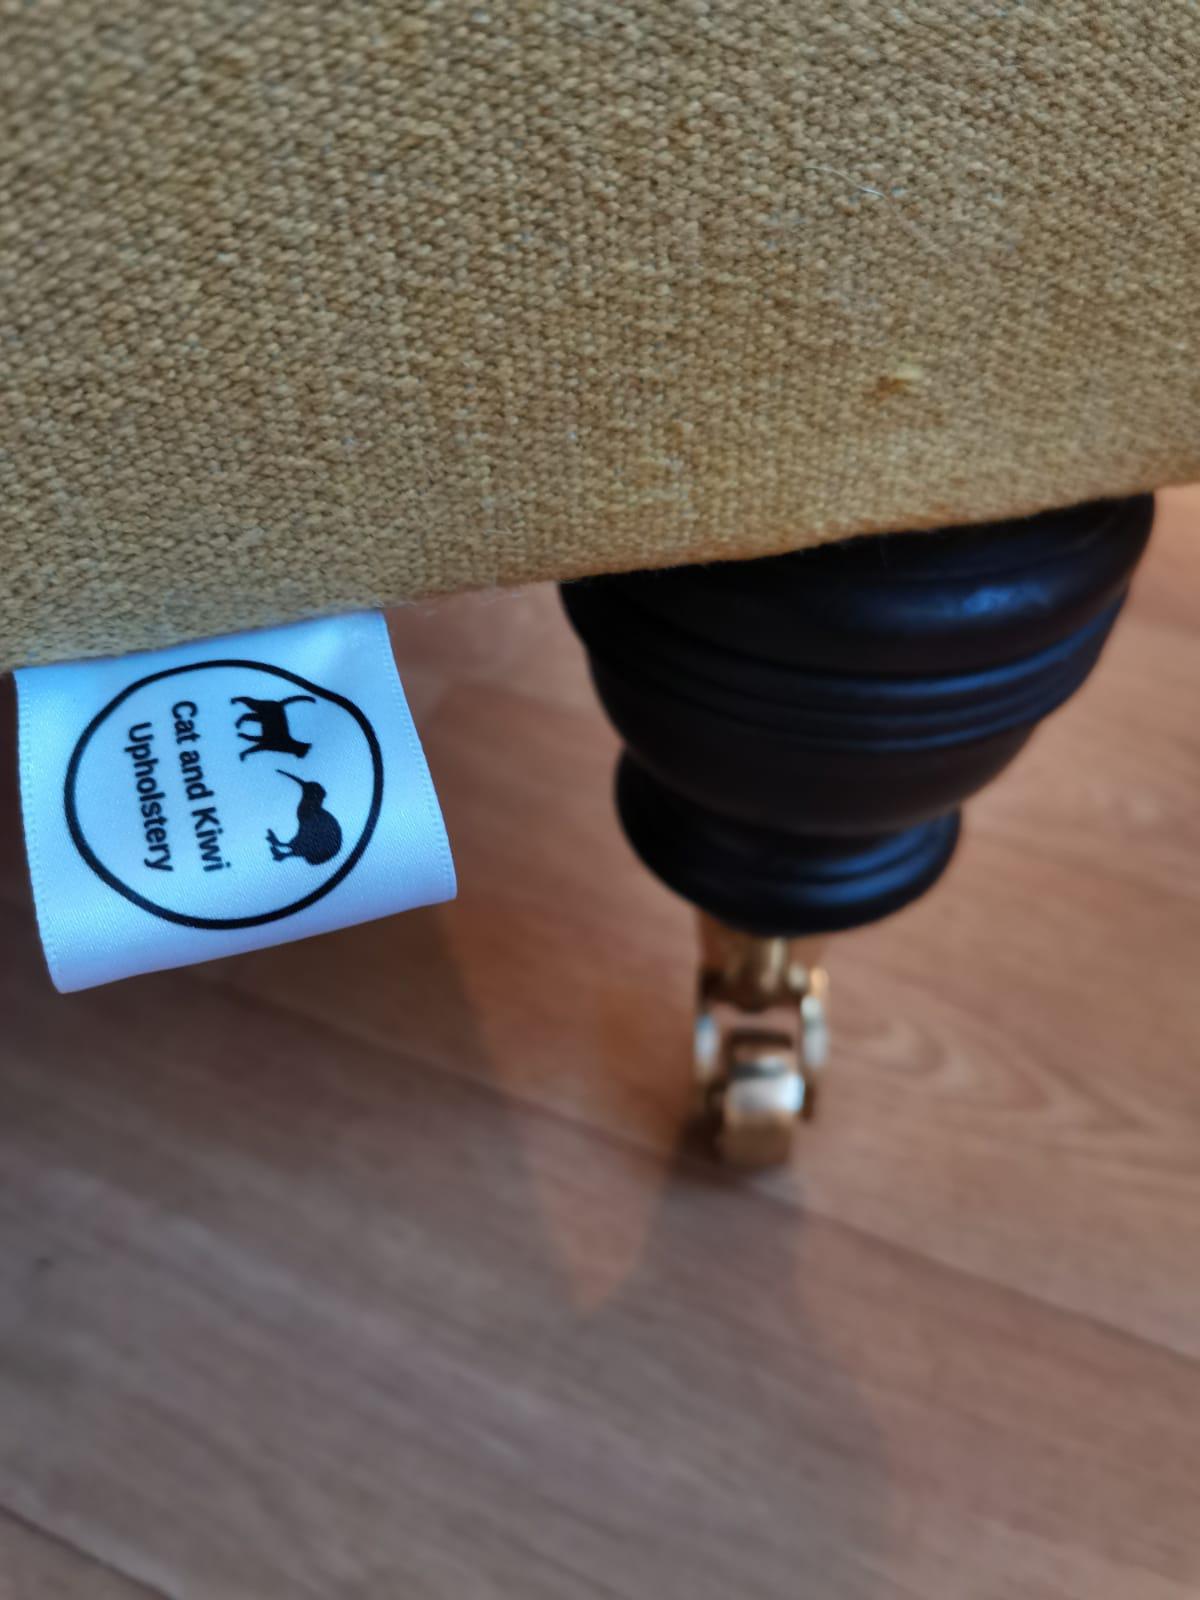 cat and kiwi label on sofa